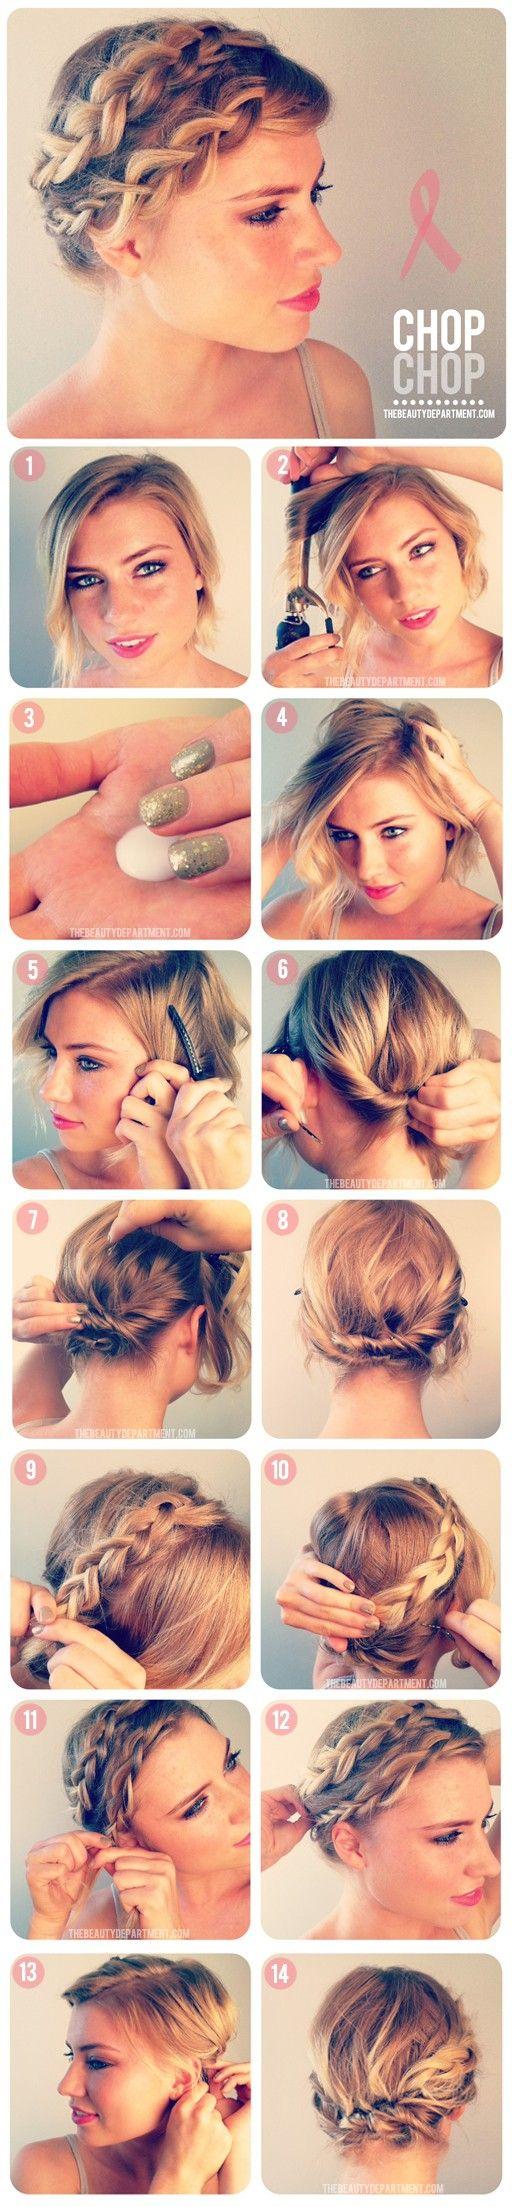 Stupendous 1000 Ideas About Braid Short Hair On Pinterest Layered Haircuts Short Hairstyles Gunalazisus